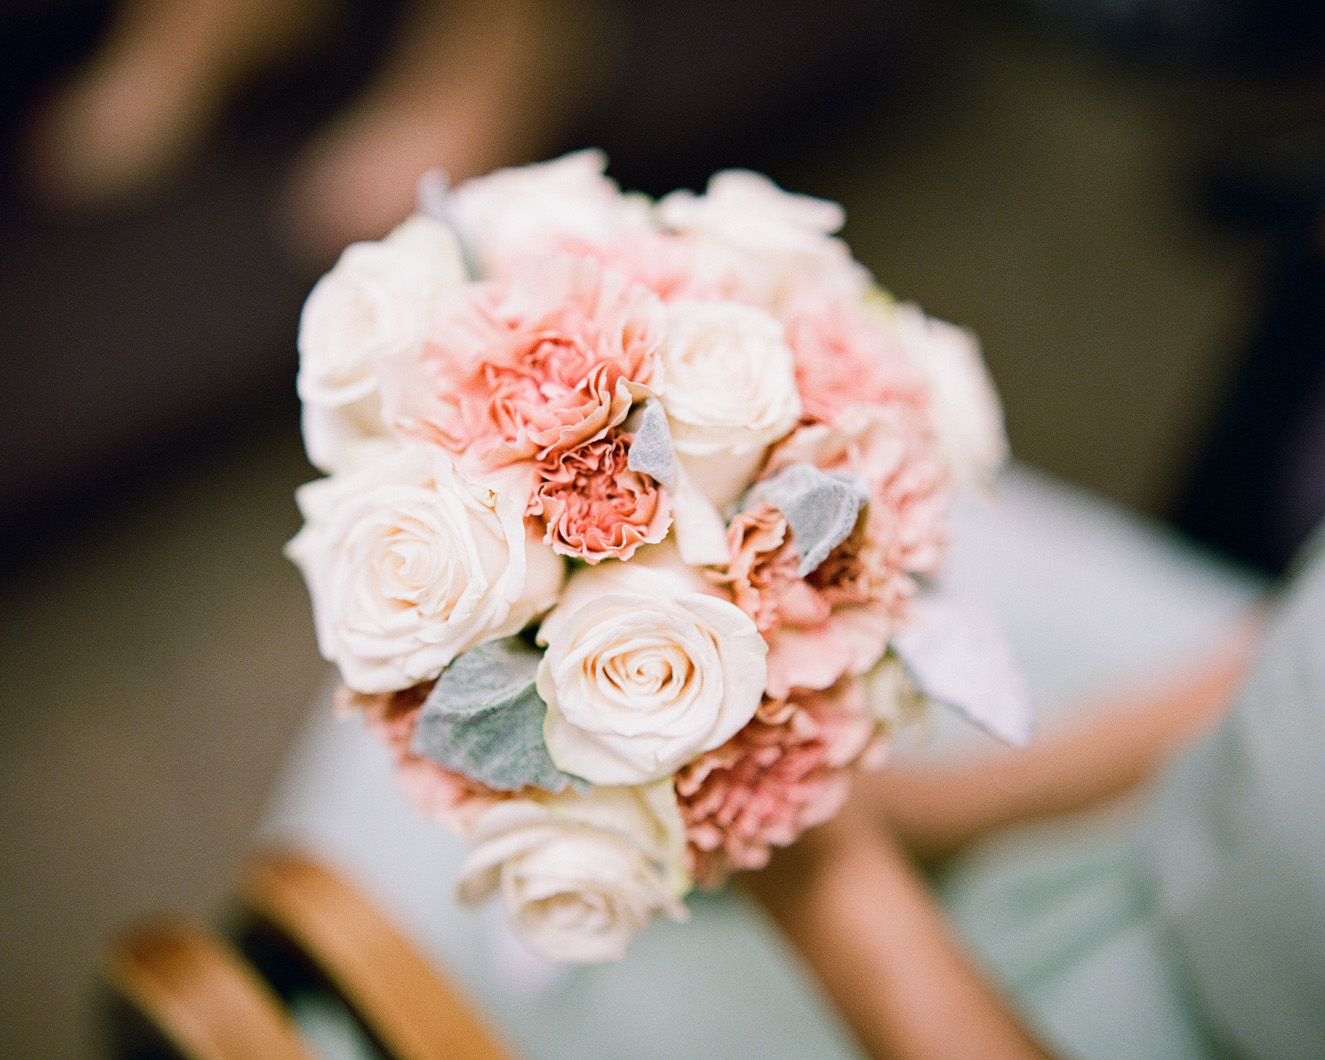 25_nyc-wedding-photographer-flower-arrangement.jpg